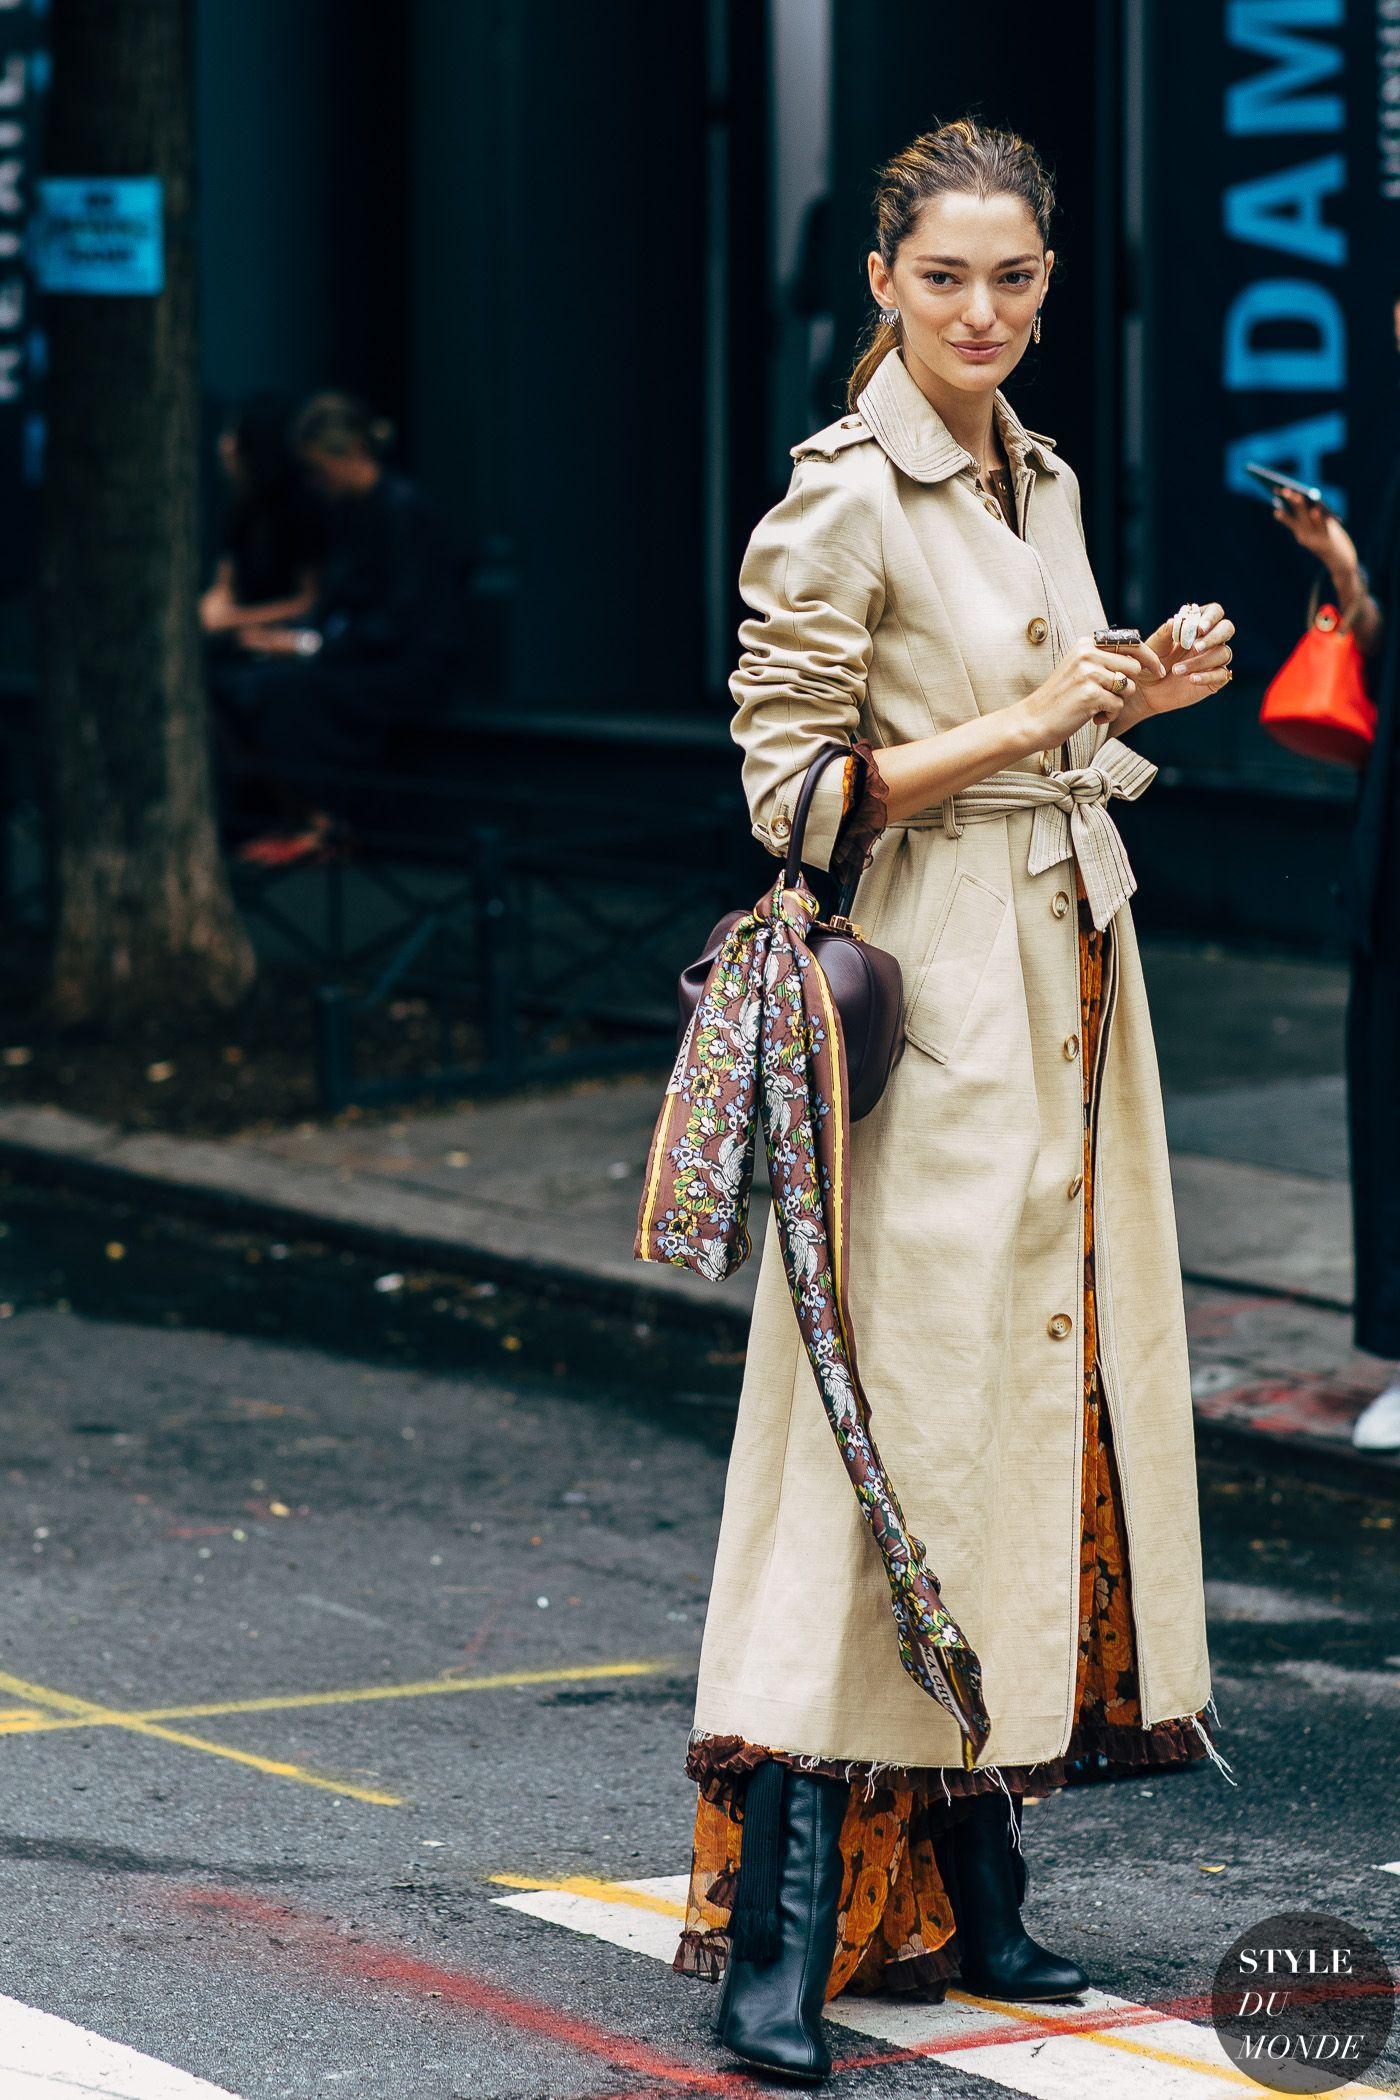 New York SS 2019 Street Style: Sofia Sanchez de Be